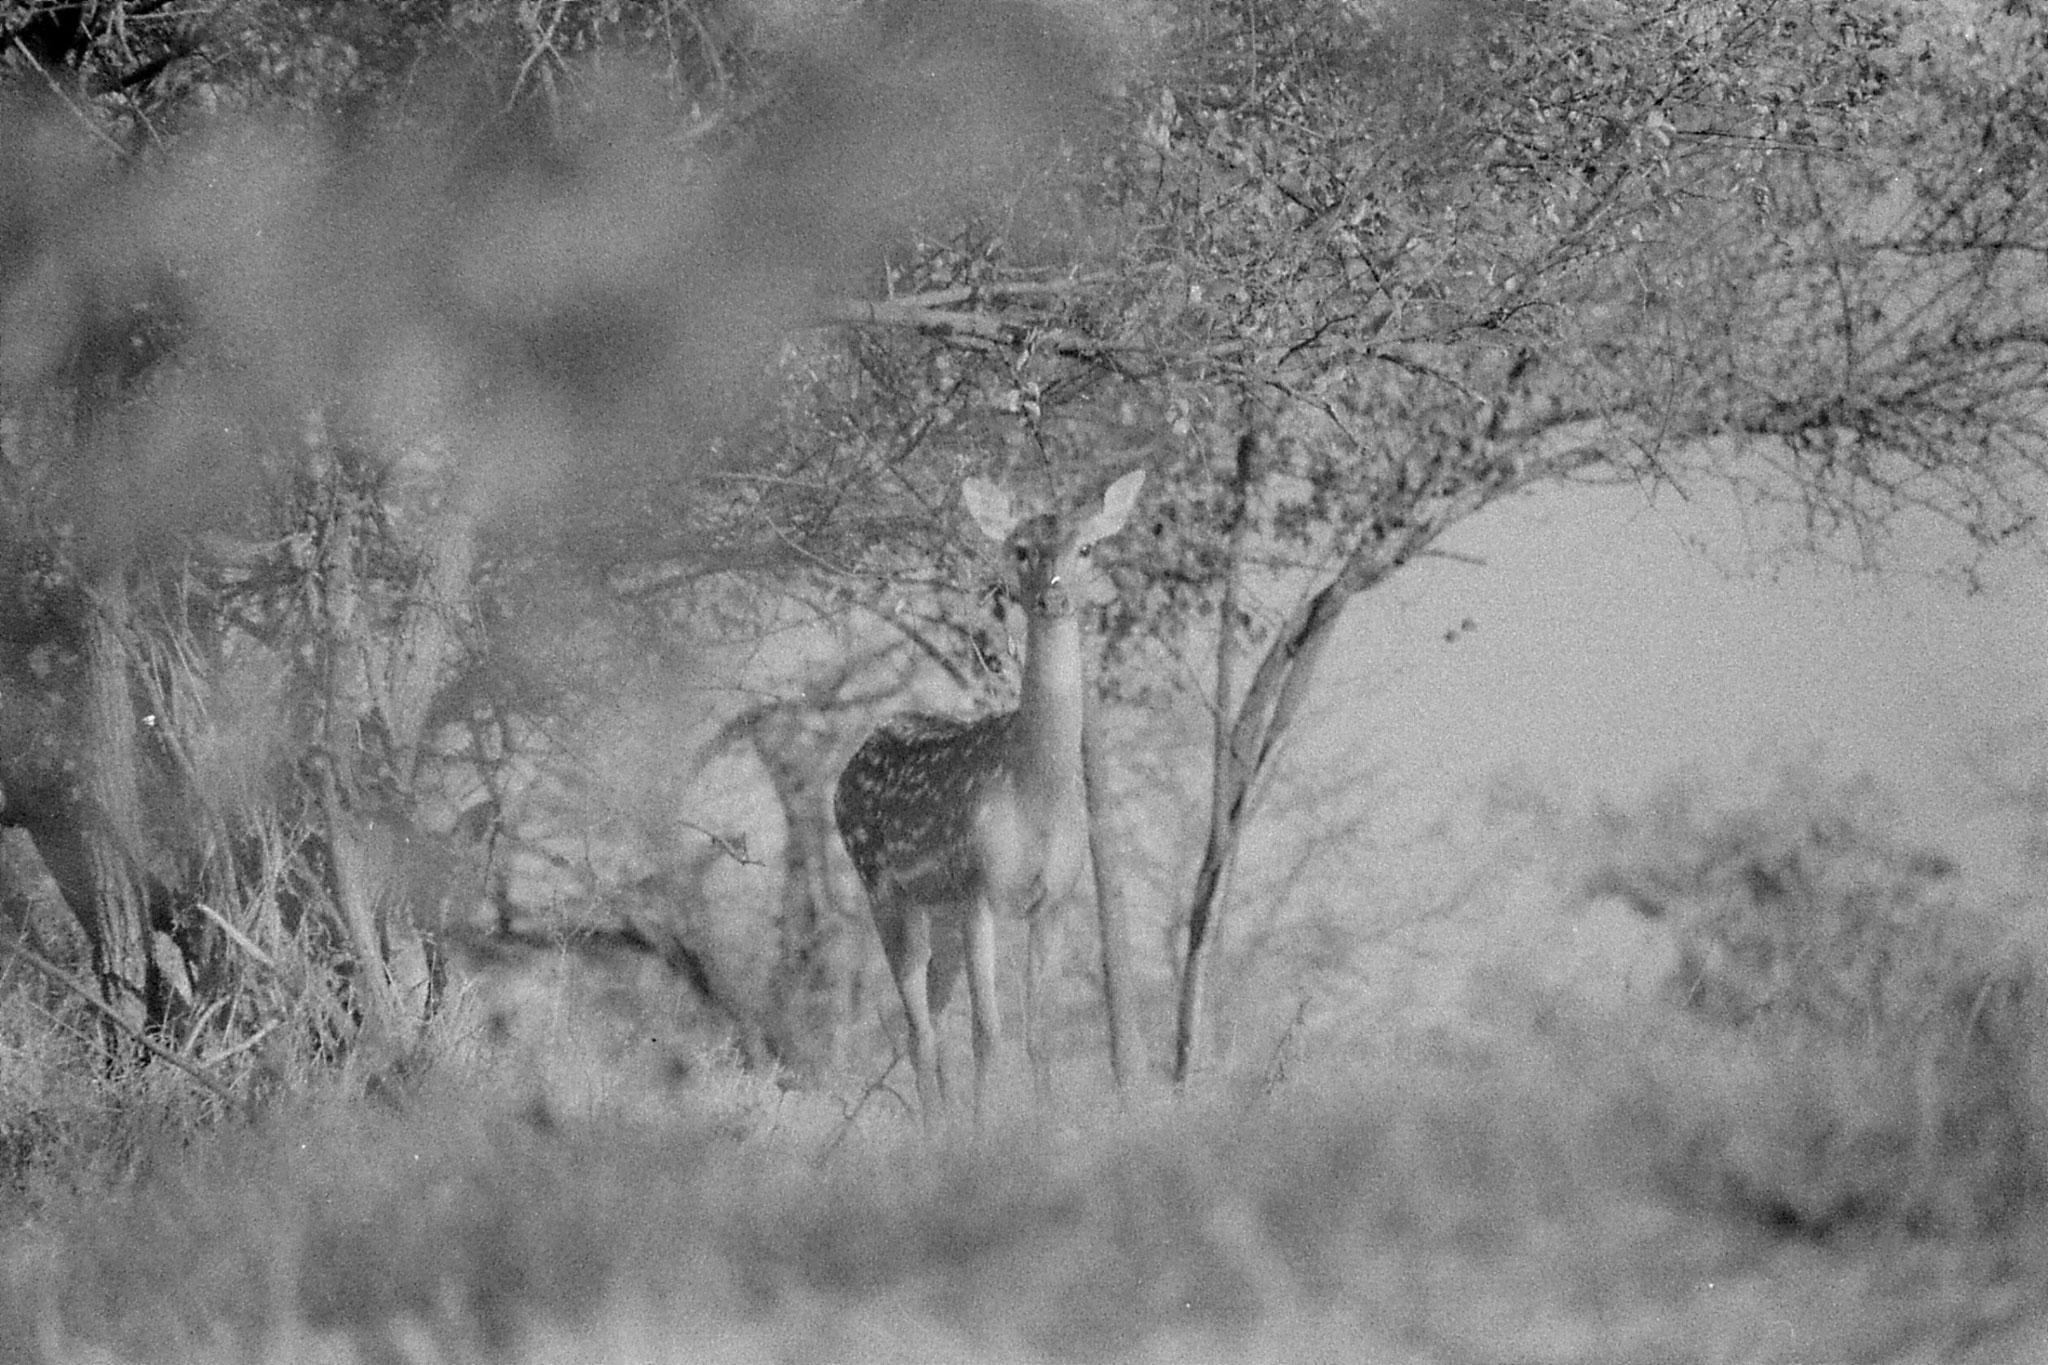 12/12/89 : 1: Sasan Gir: Spotted deer